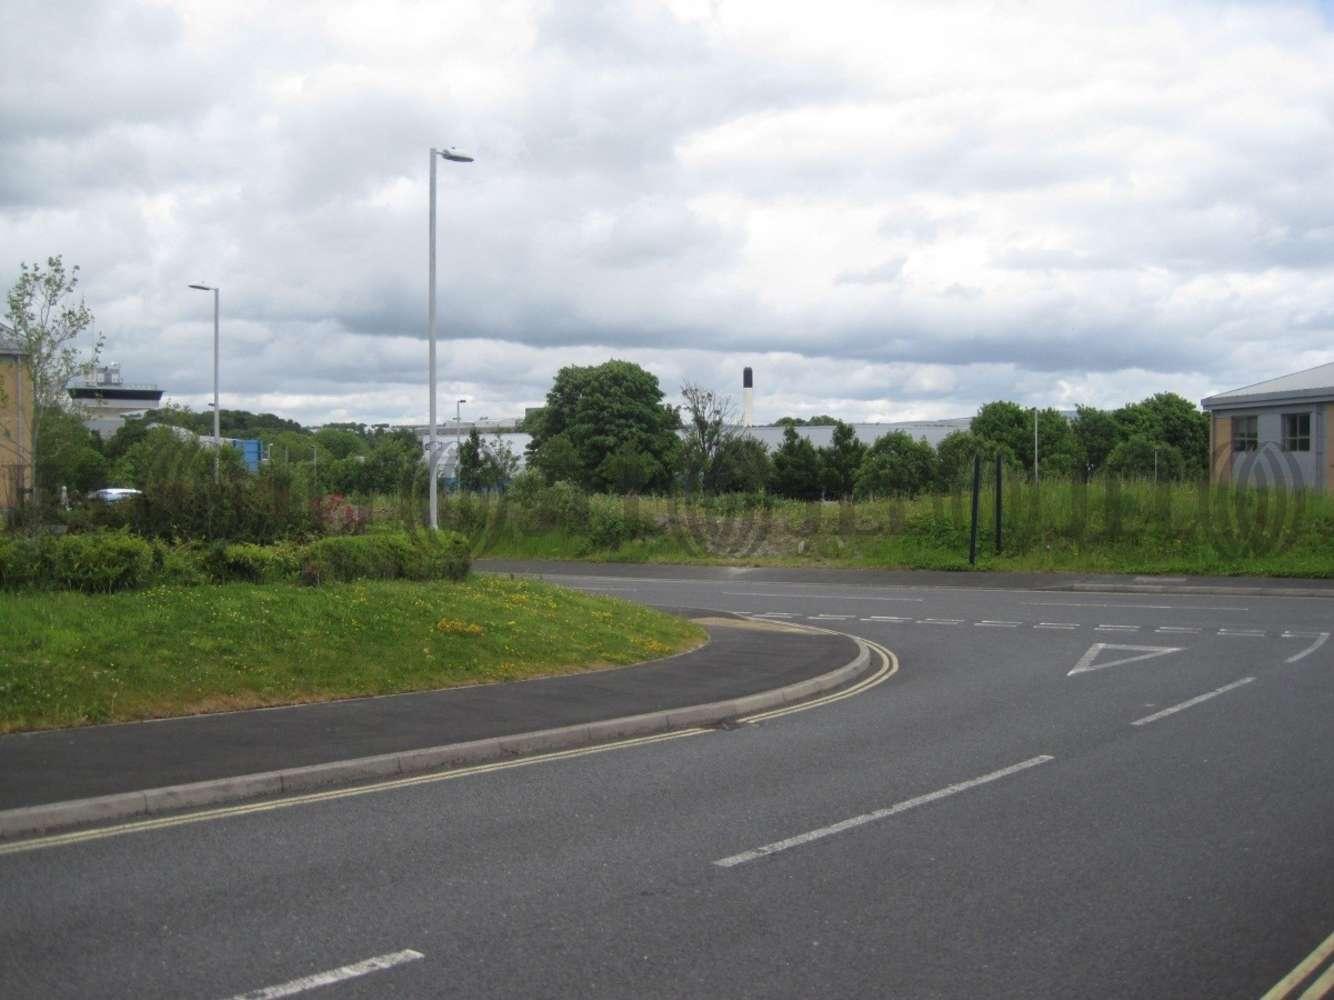 Land Plymouth, PL6 5WR - Plot C378 William Prance Road - 378